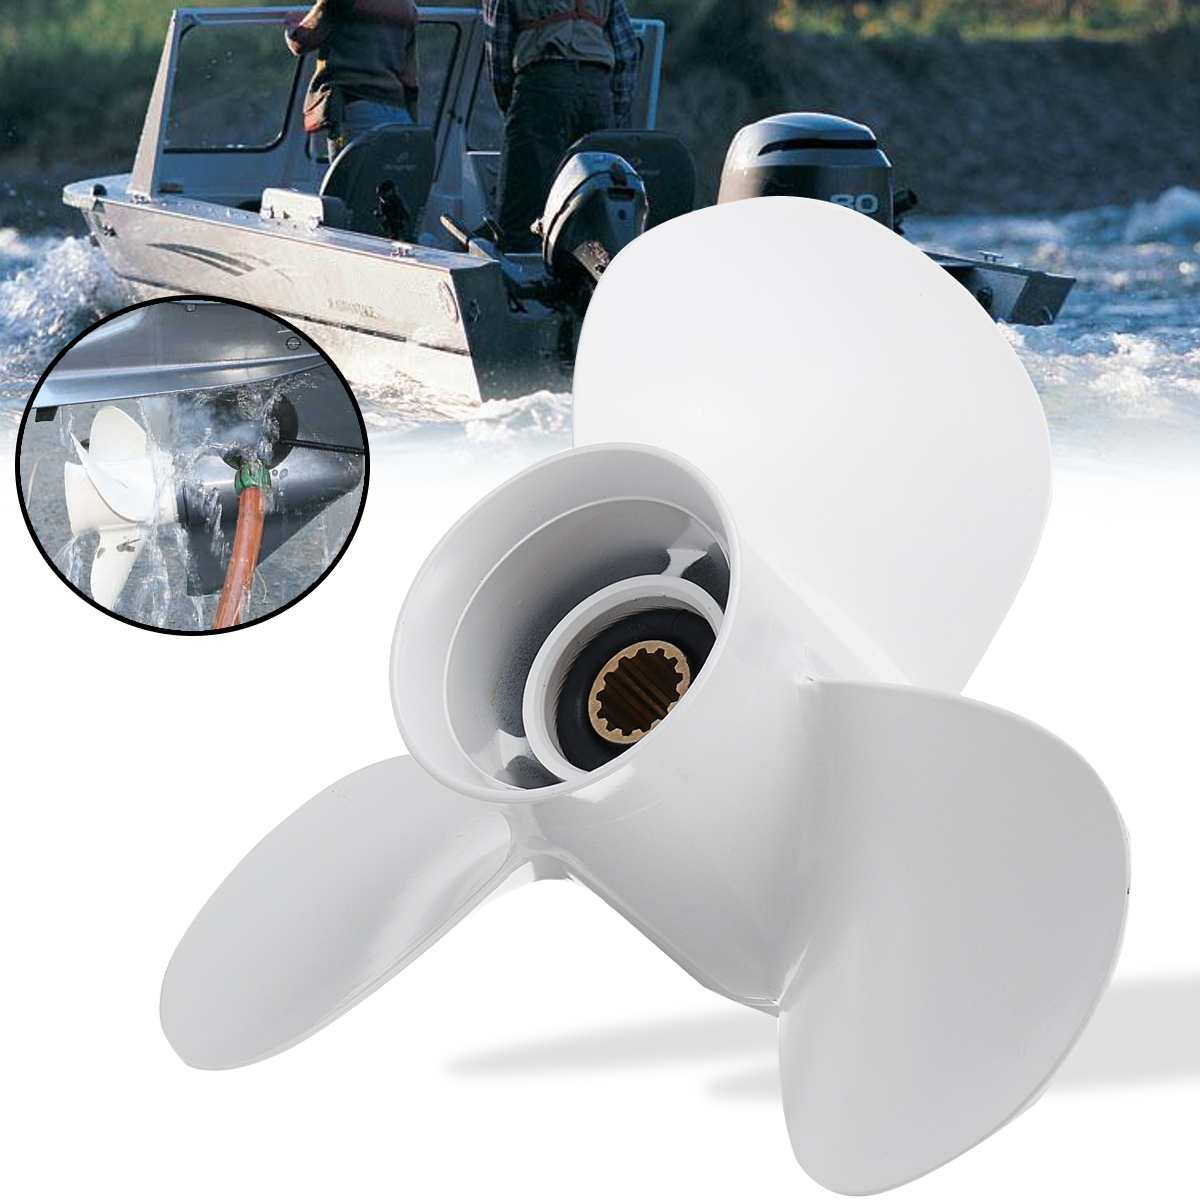 69W-45958-00-EL Aluminum Propeller 11 1//4x14-G For 40HP 50HP Yamaha Outboard